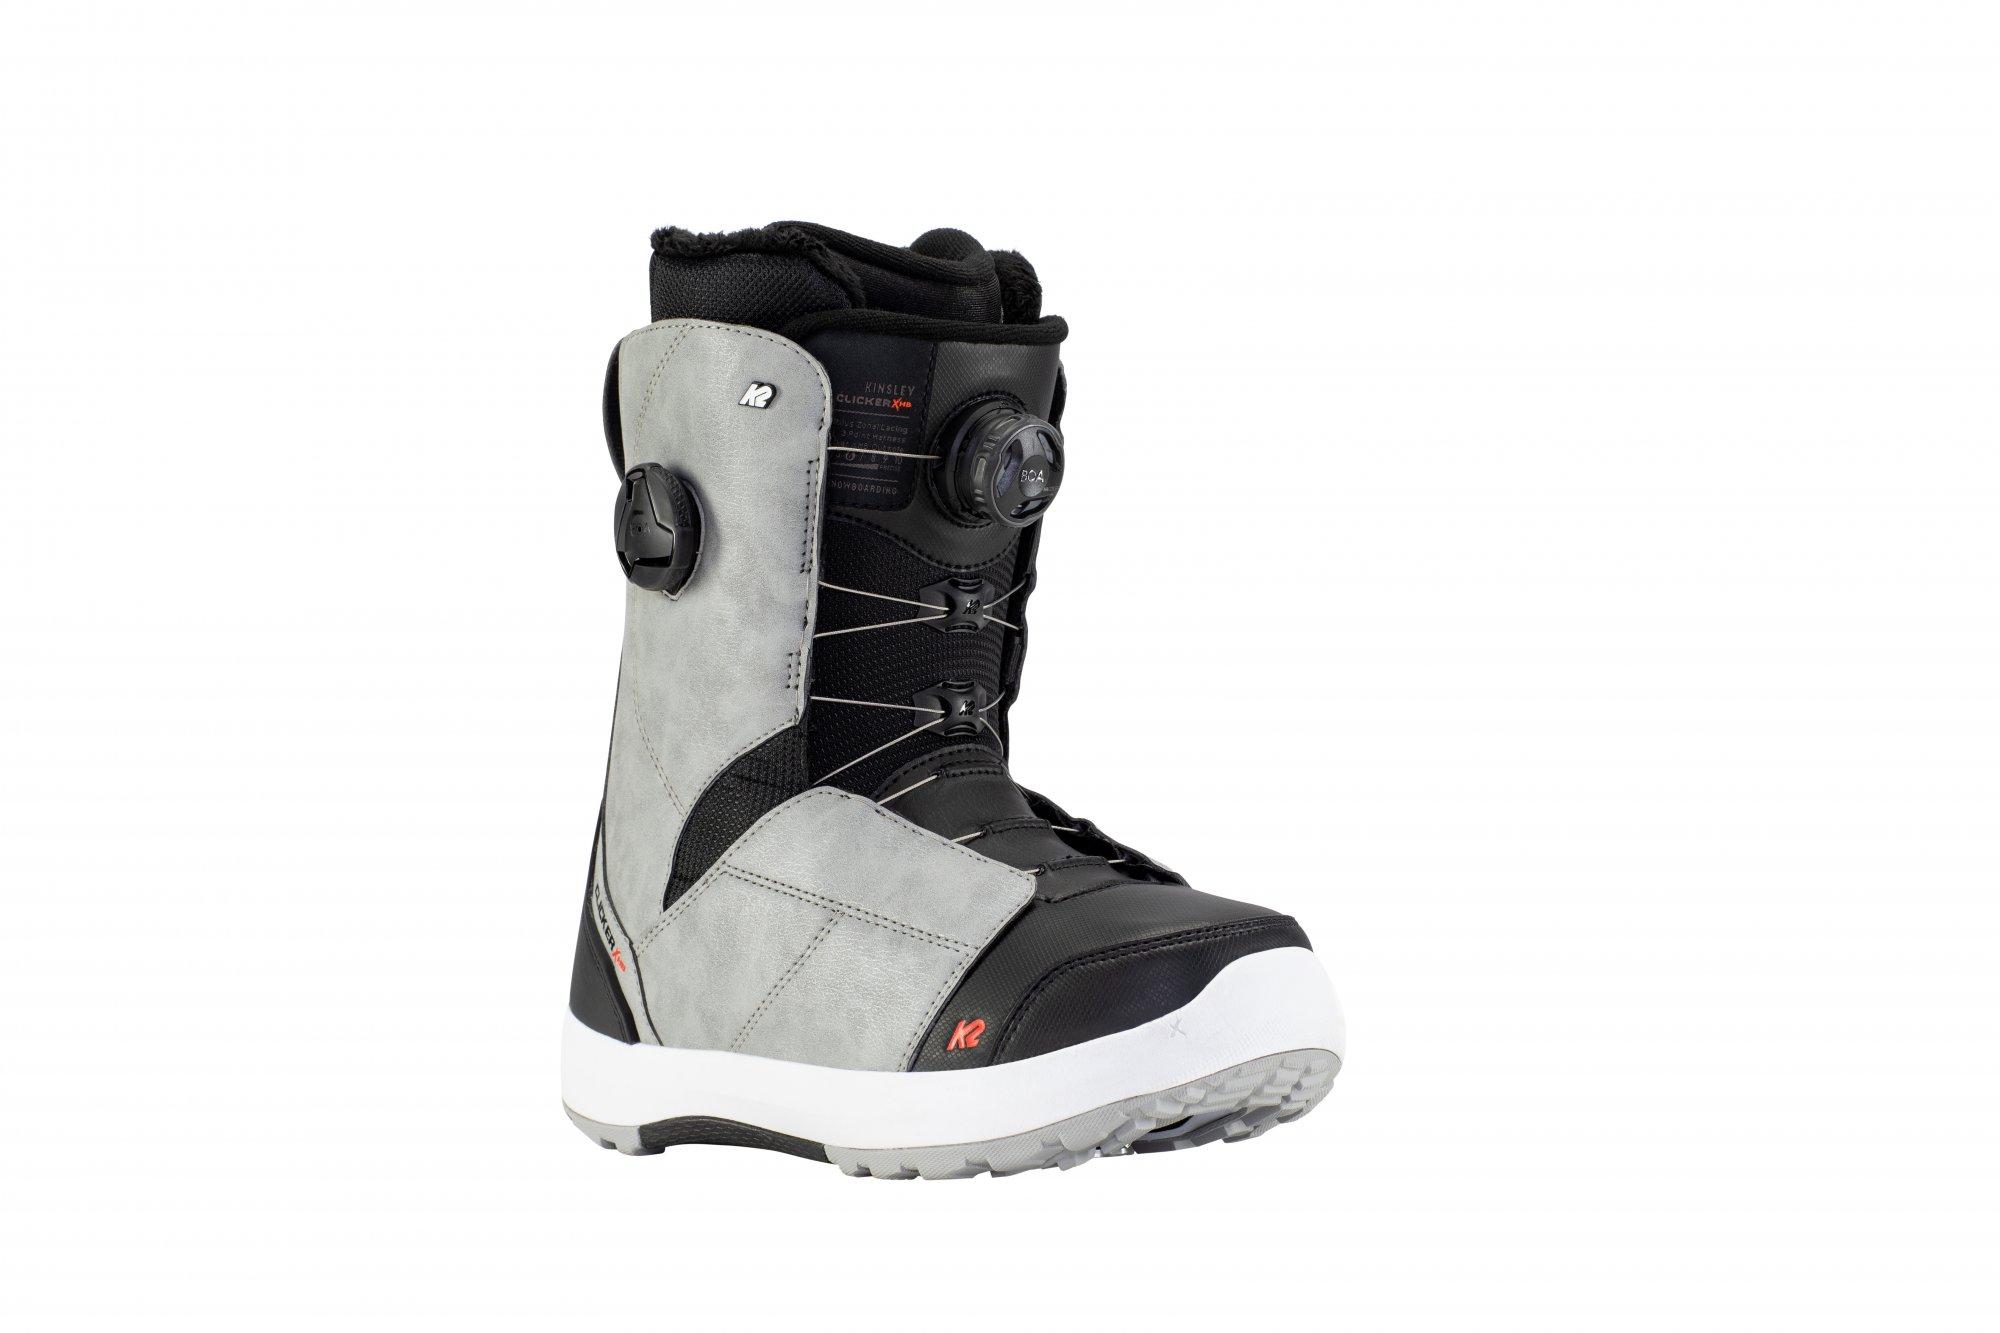 2021 K2 Kinsley Clicker X HB Women's Snowboard Boots